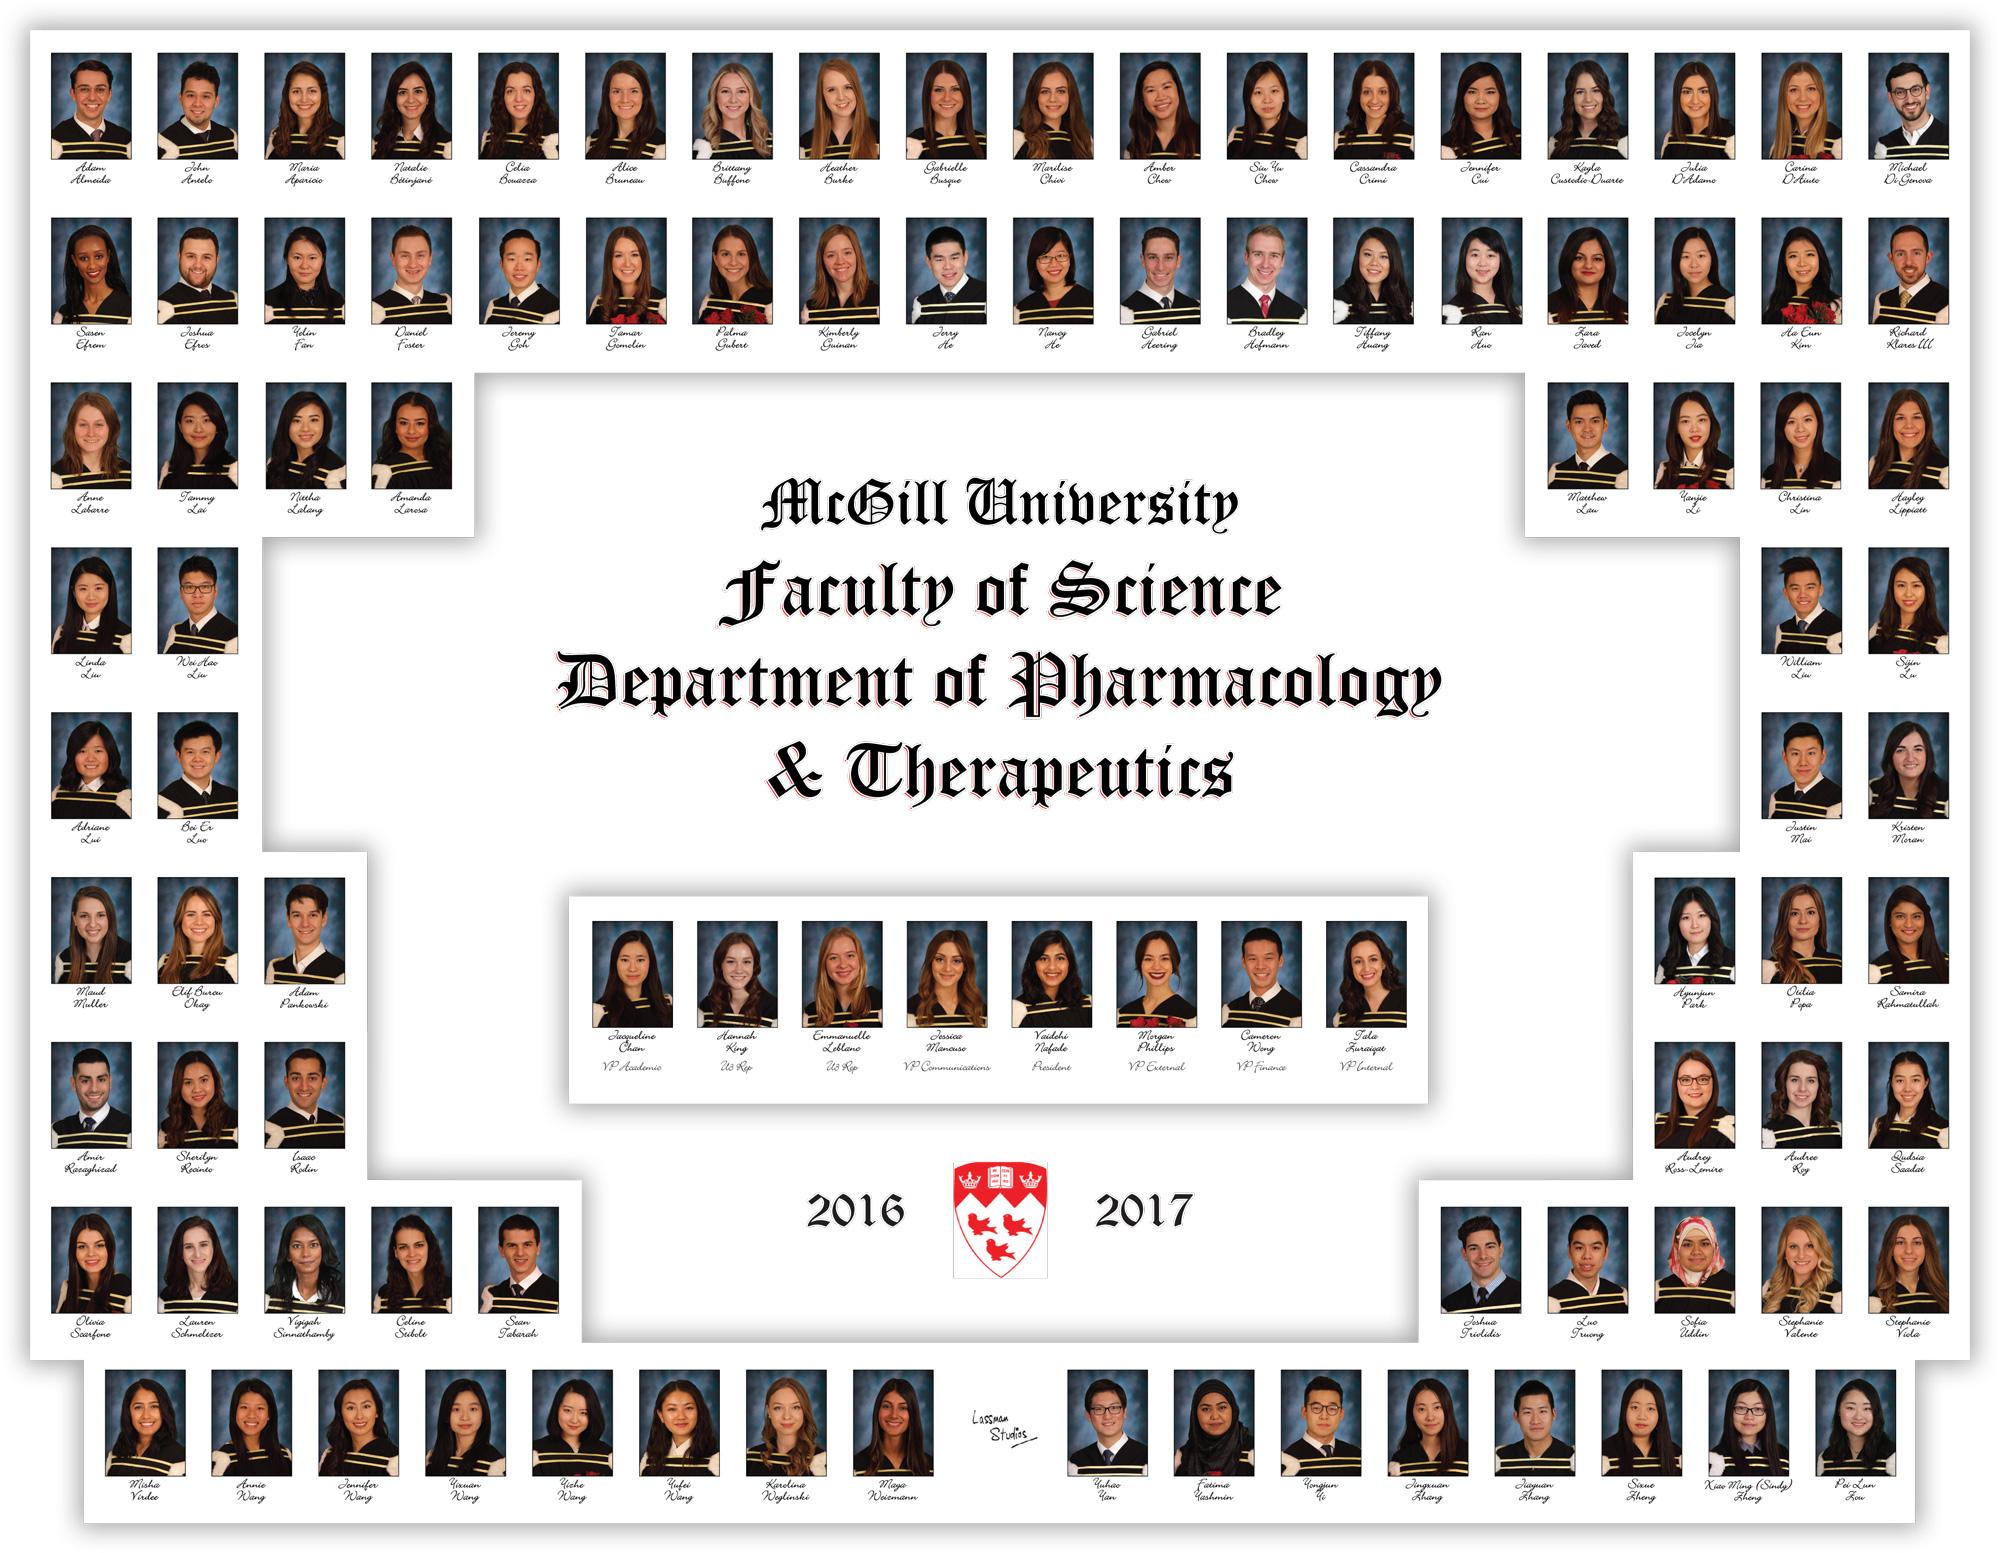 Mosaics-2017-Pharmacology-and-Therapeutics